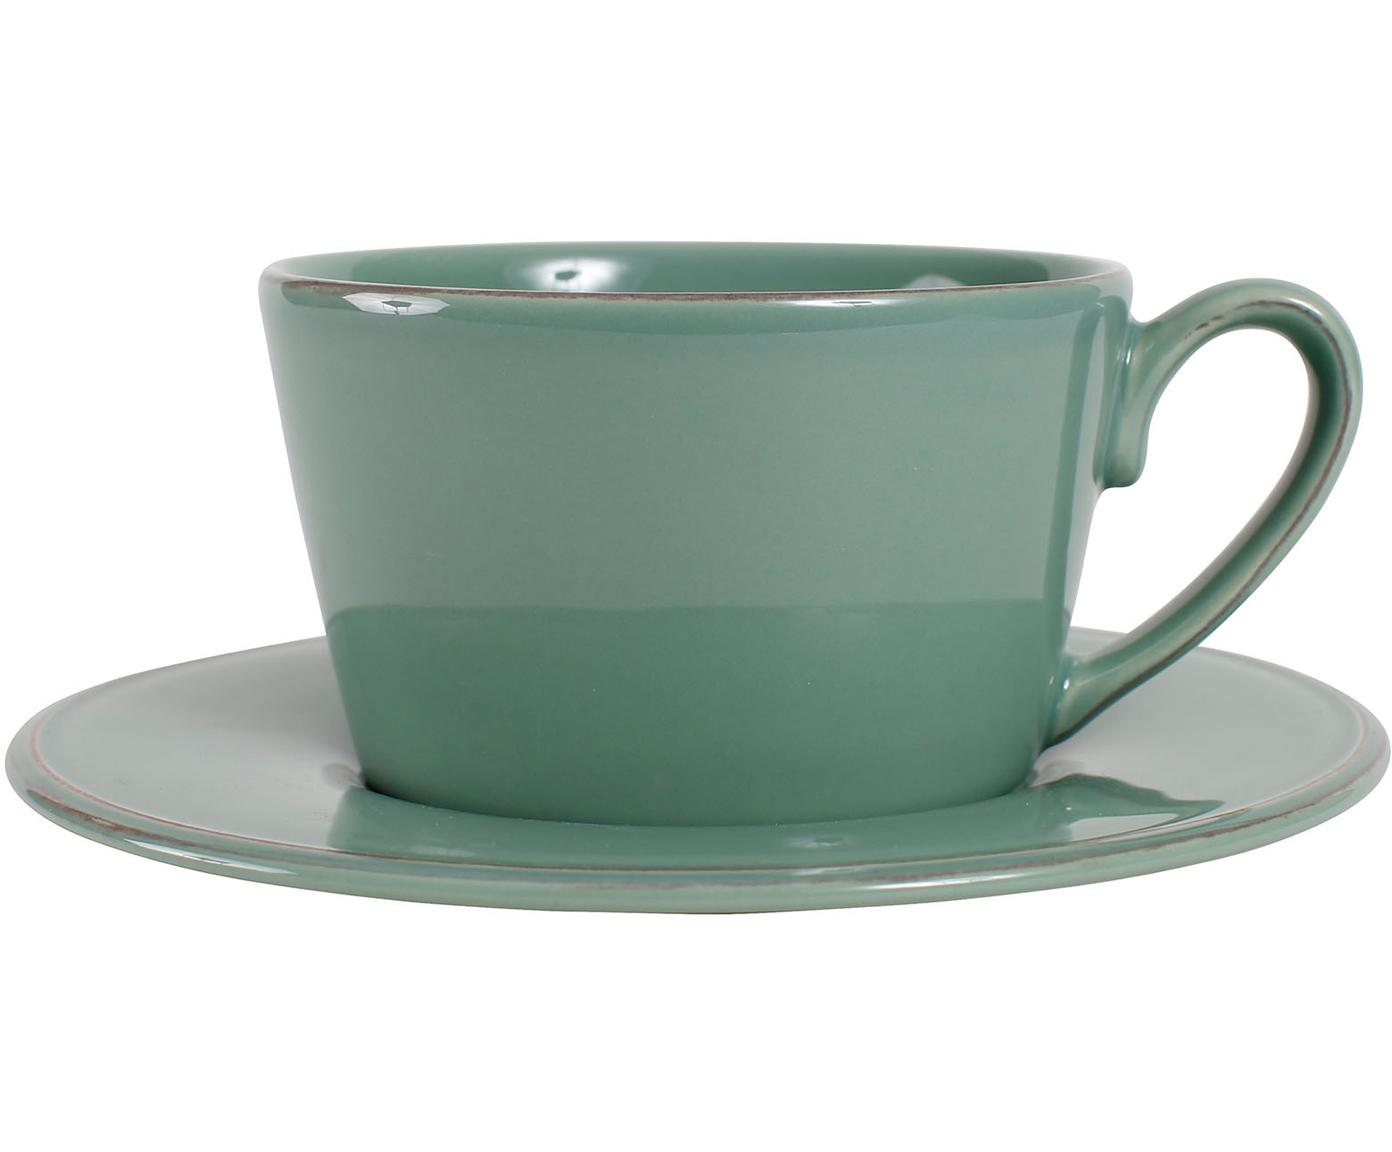 Tazza da tè con piattino Constance, Terracotta, Verde, Ø 19 x Alt. 8 cm